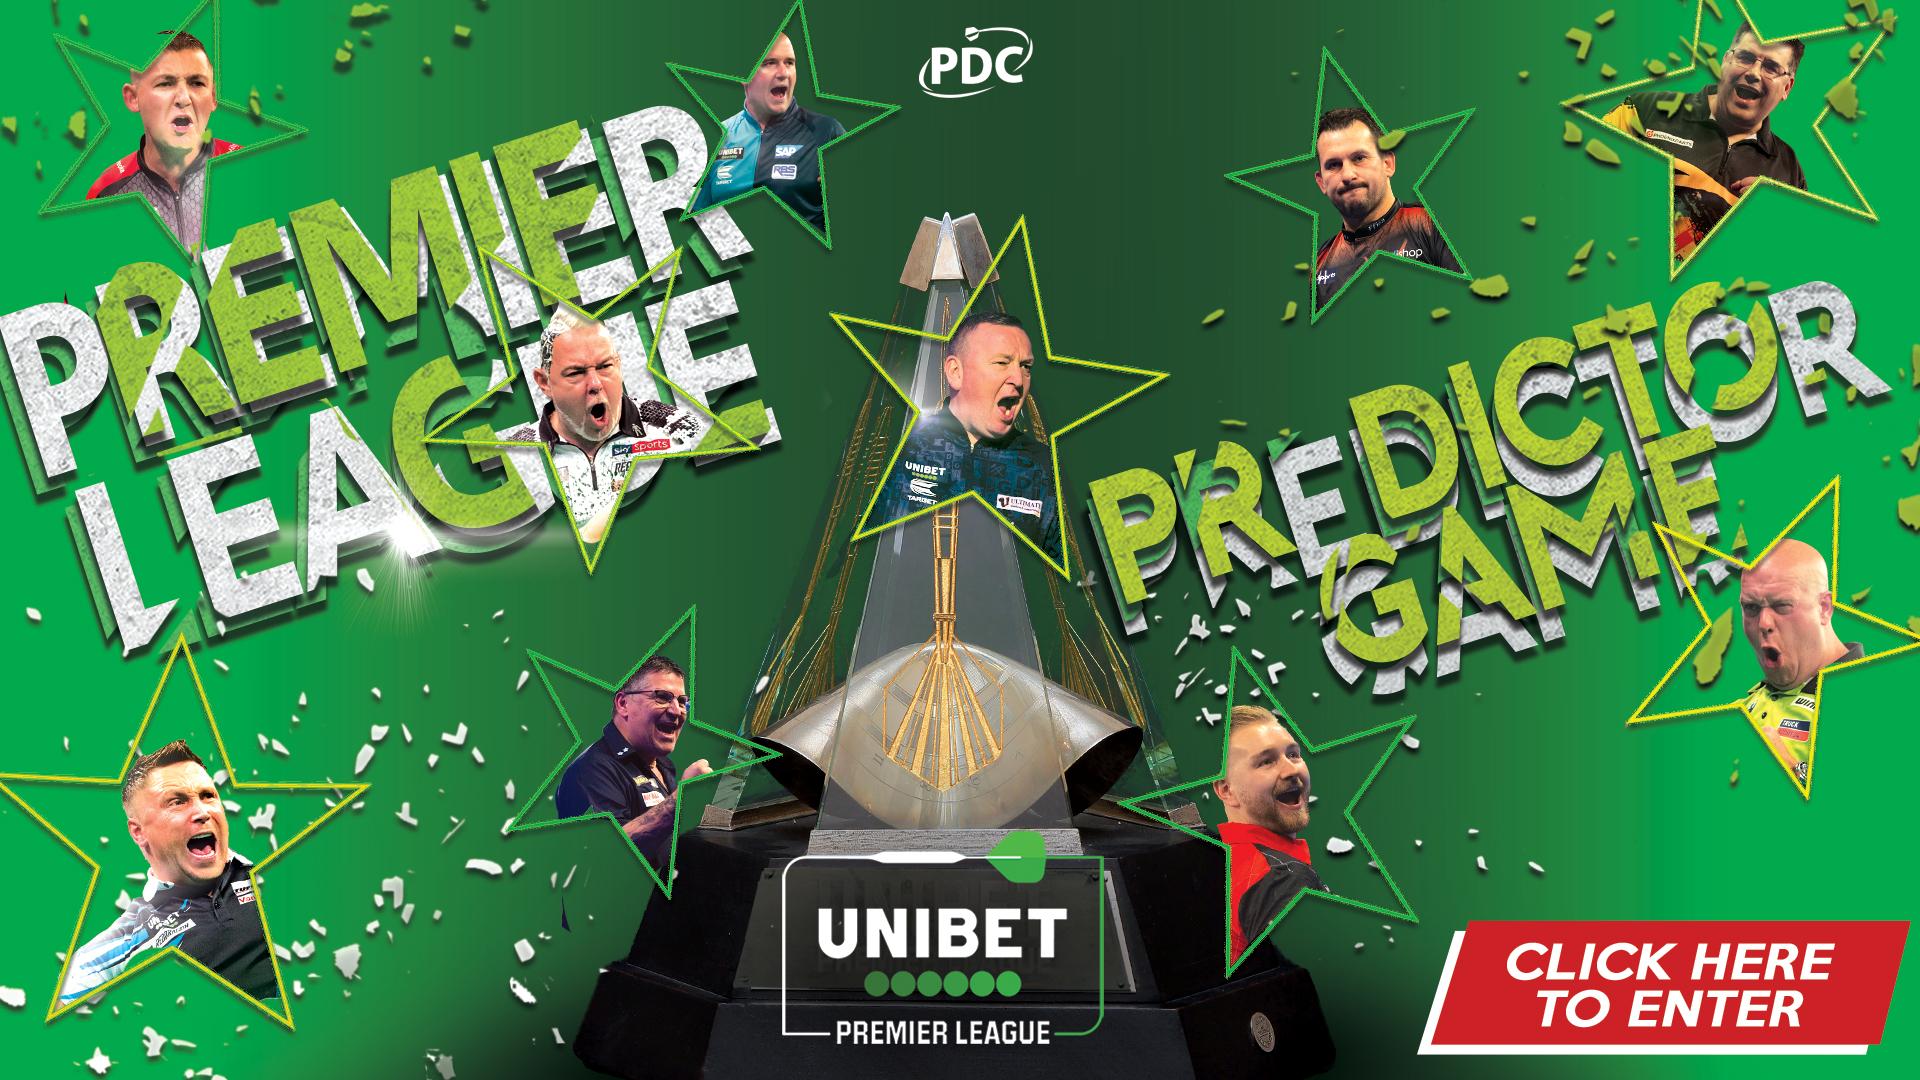 Unibet Premier League Predictor Game